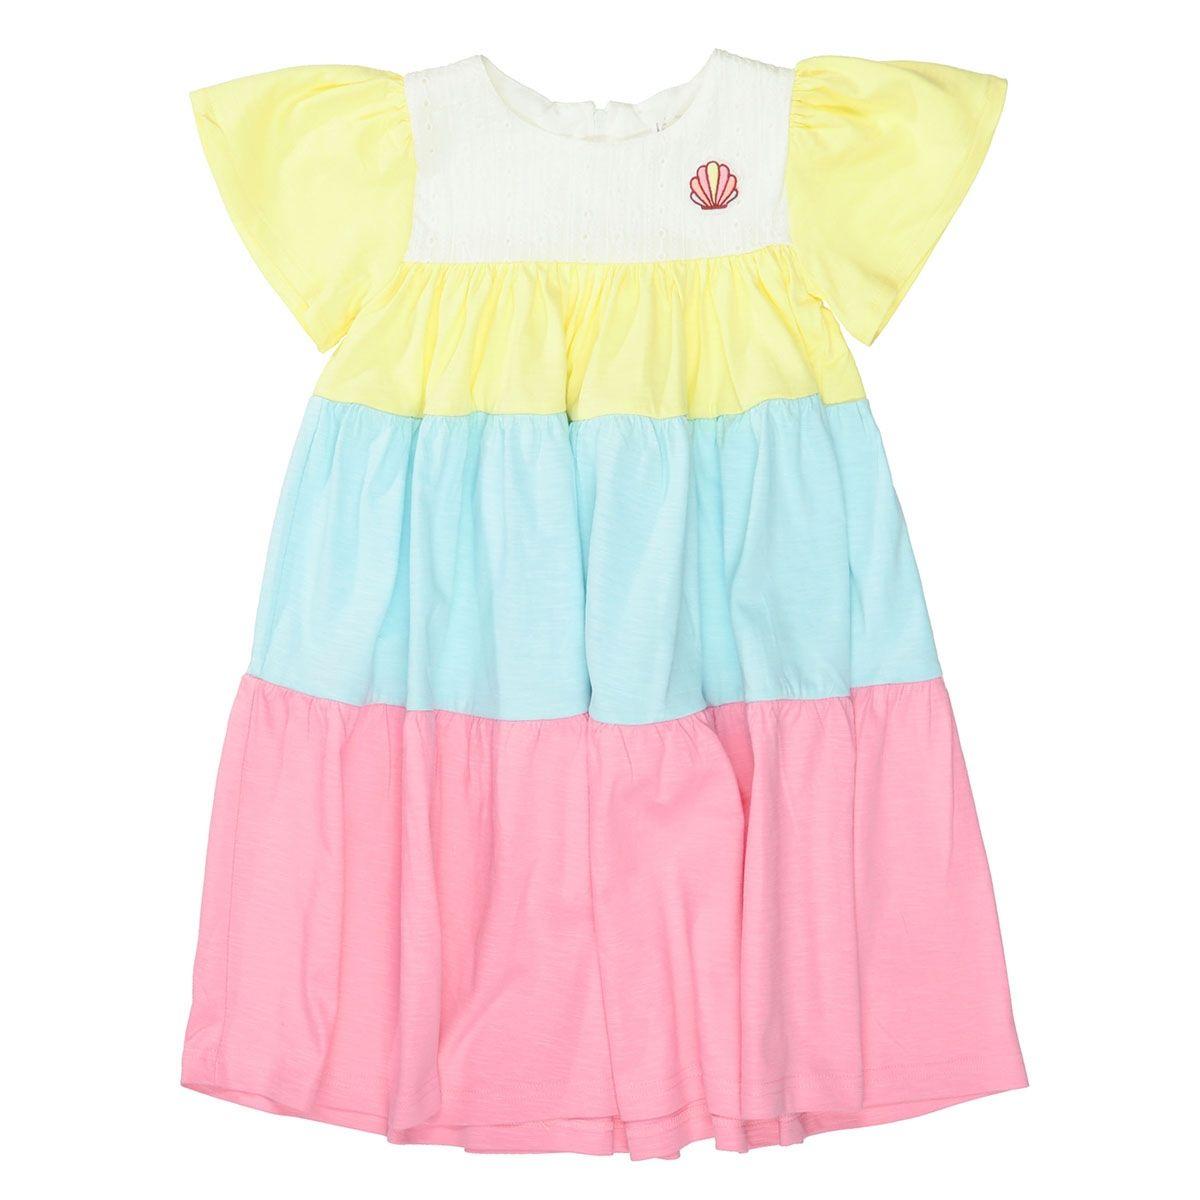 JETTE Kleid mit Colour-Blocking - Multi